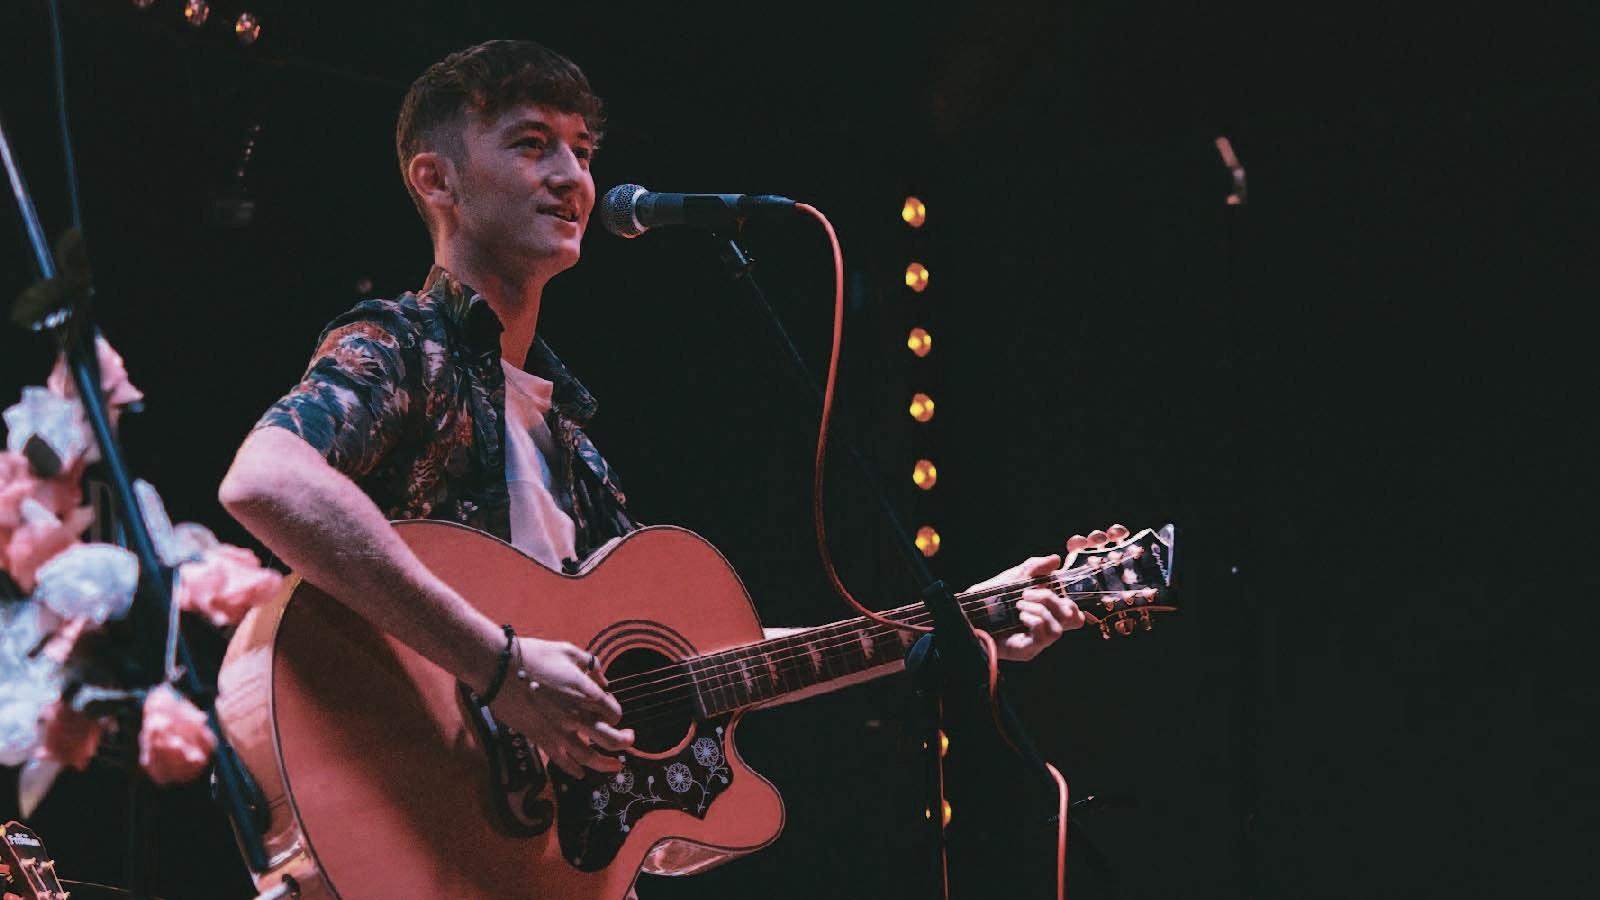 Cameron Ledwidge at Sneaky Pete's, Edinburgh